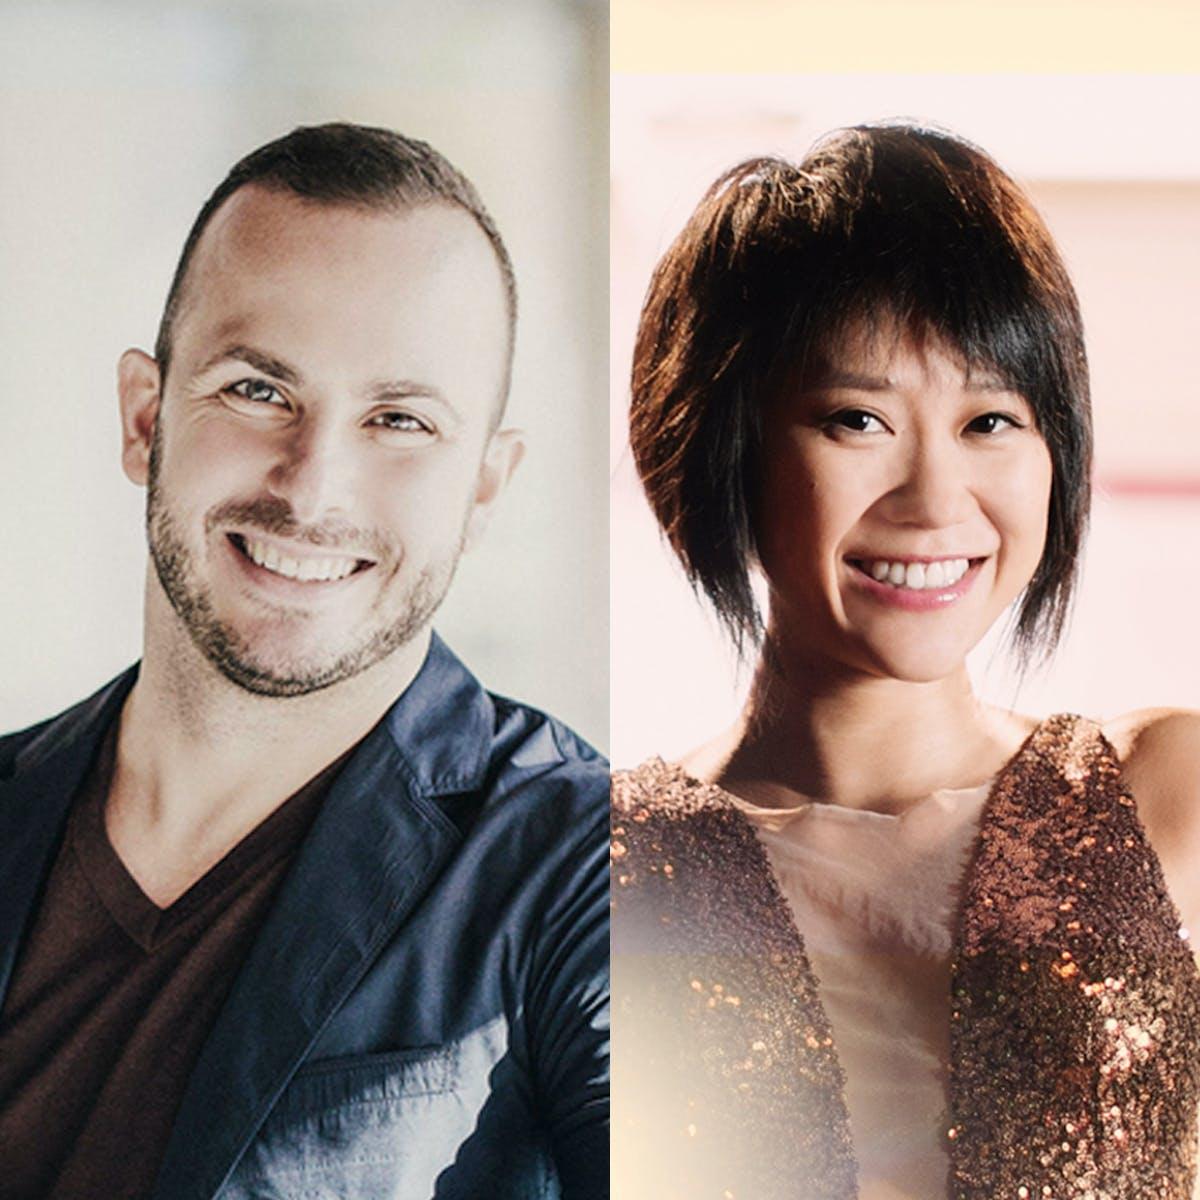 Yannick Nézet-Séguin and Yuja Wang